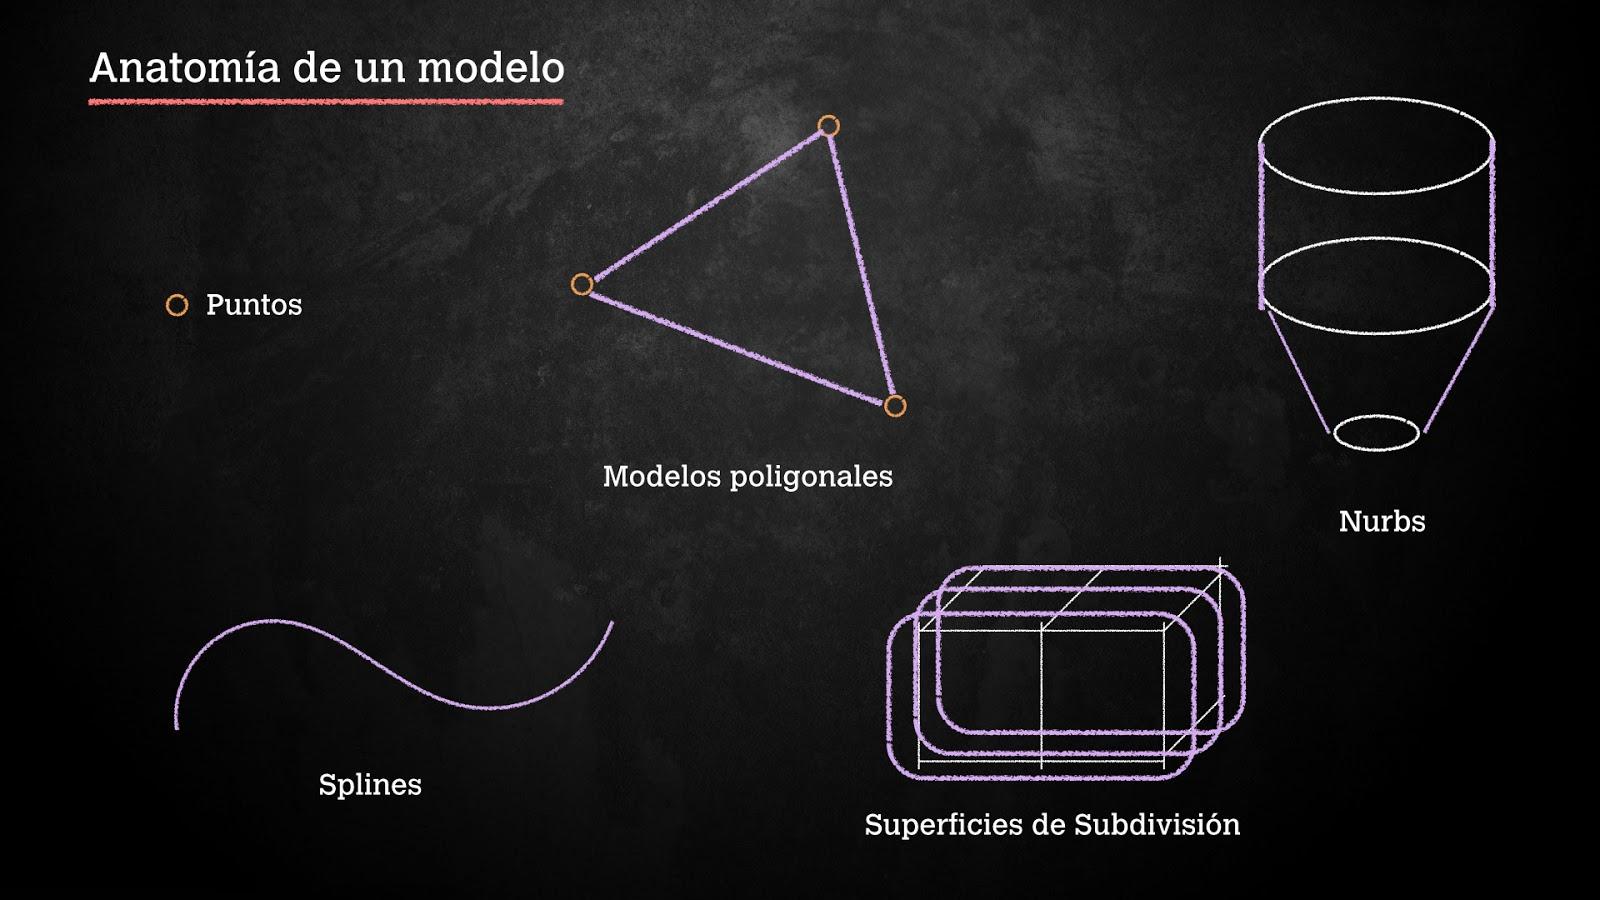 Cinema4D en español: 3.2 Anatomía de un modelo